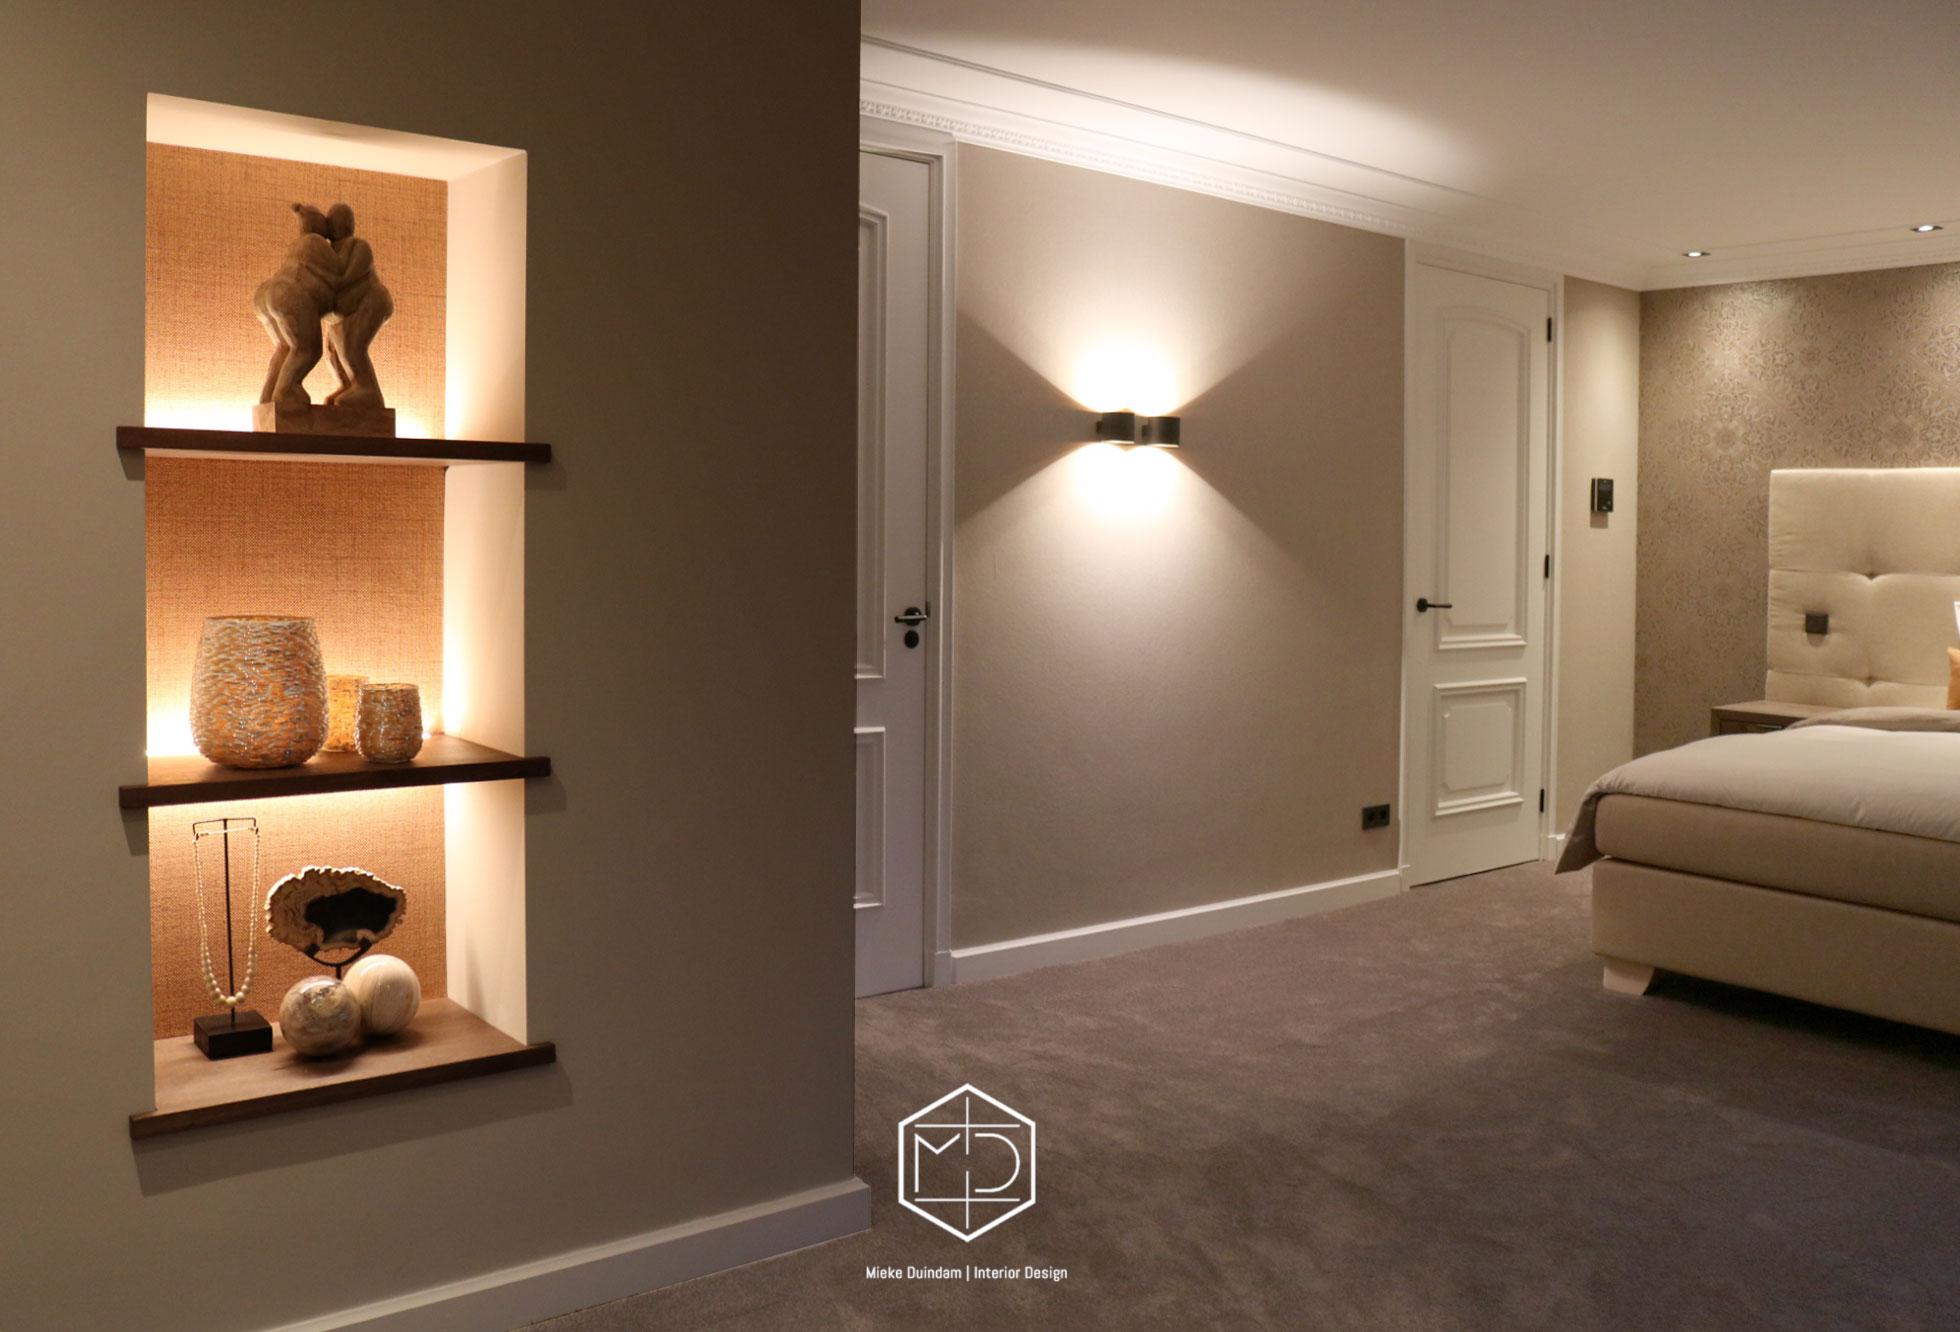 Mieke-Duindam-Interior-Design-interieuradvies-interieur-advies-westland-wateringen-project-master-bedroom